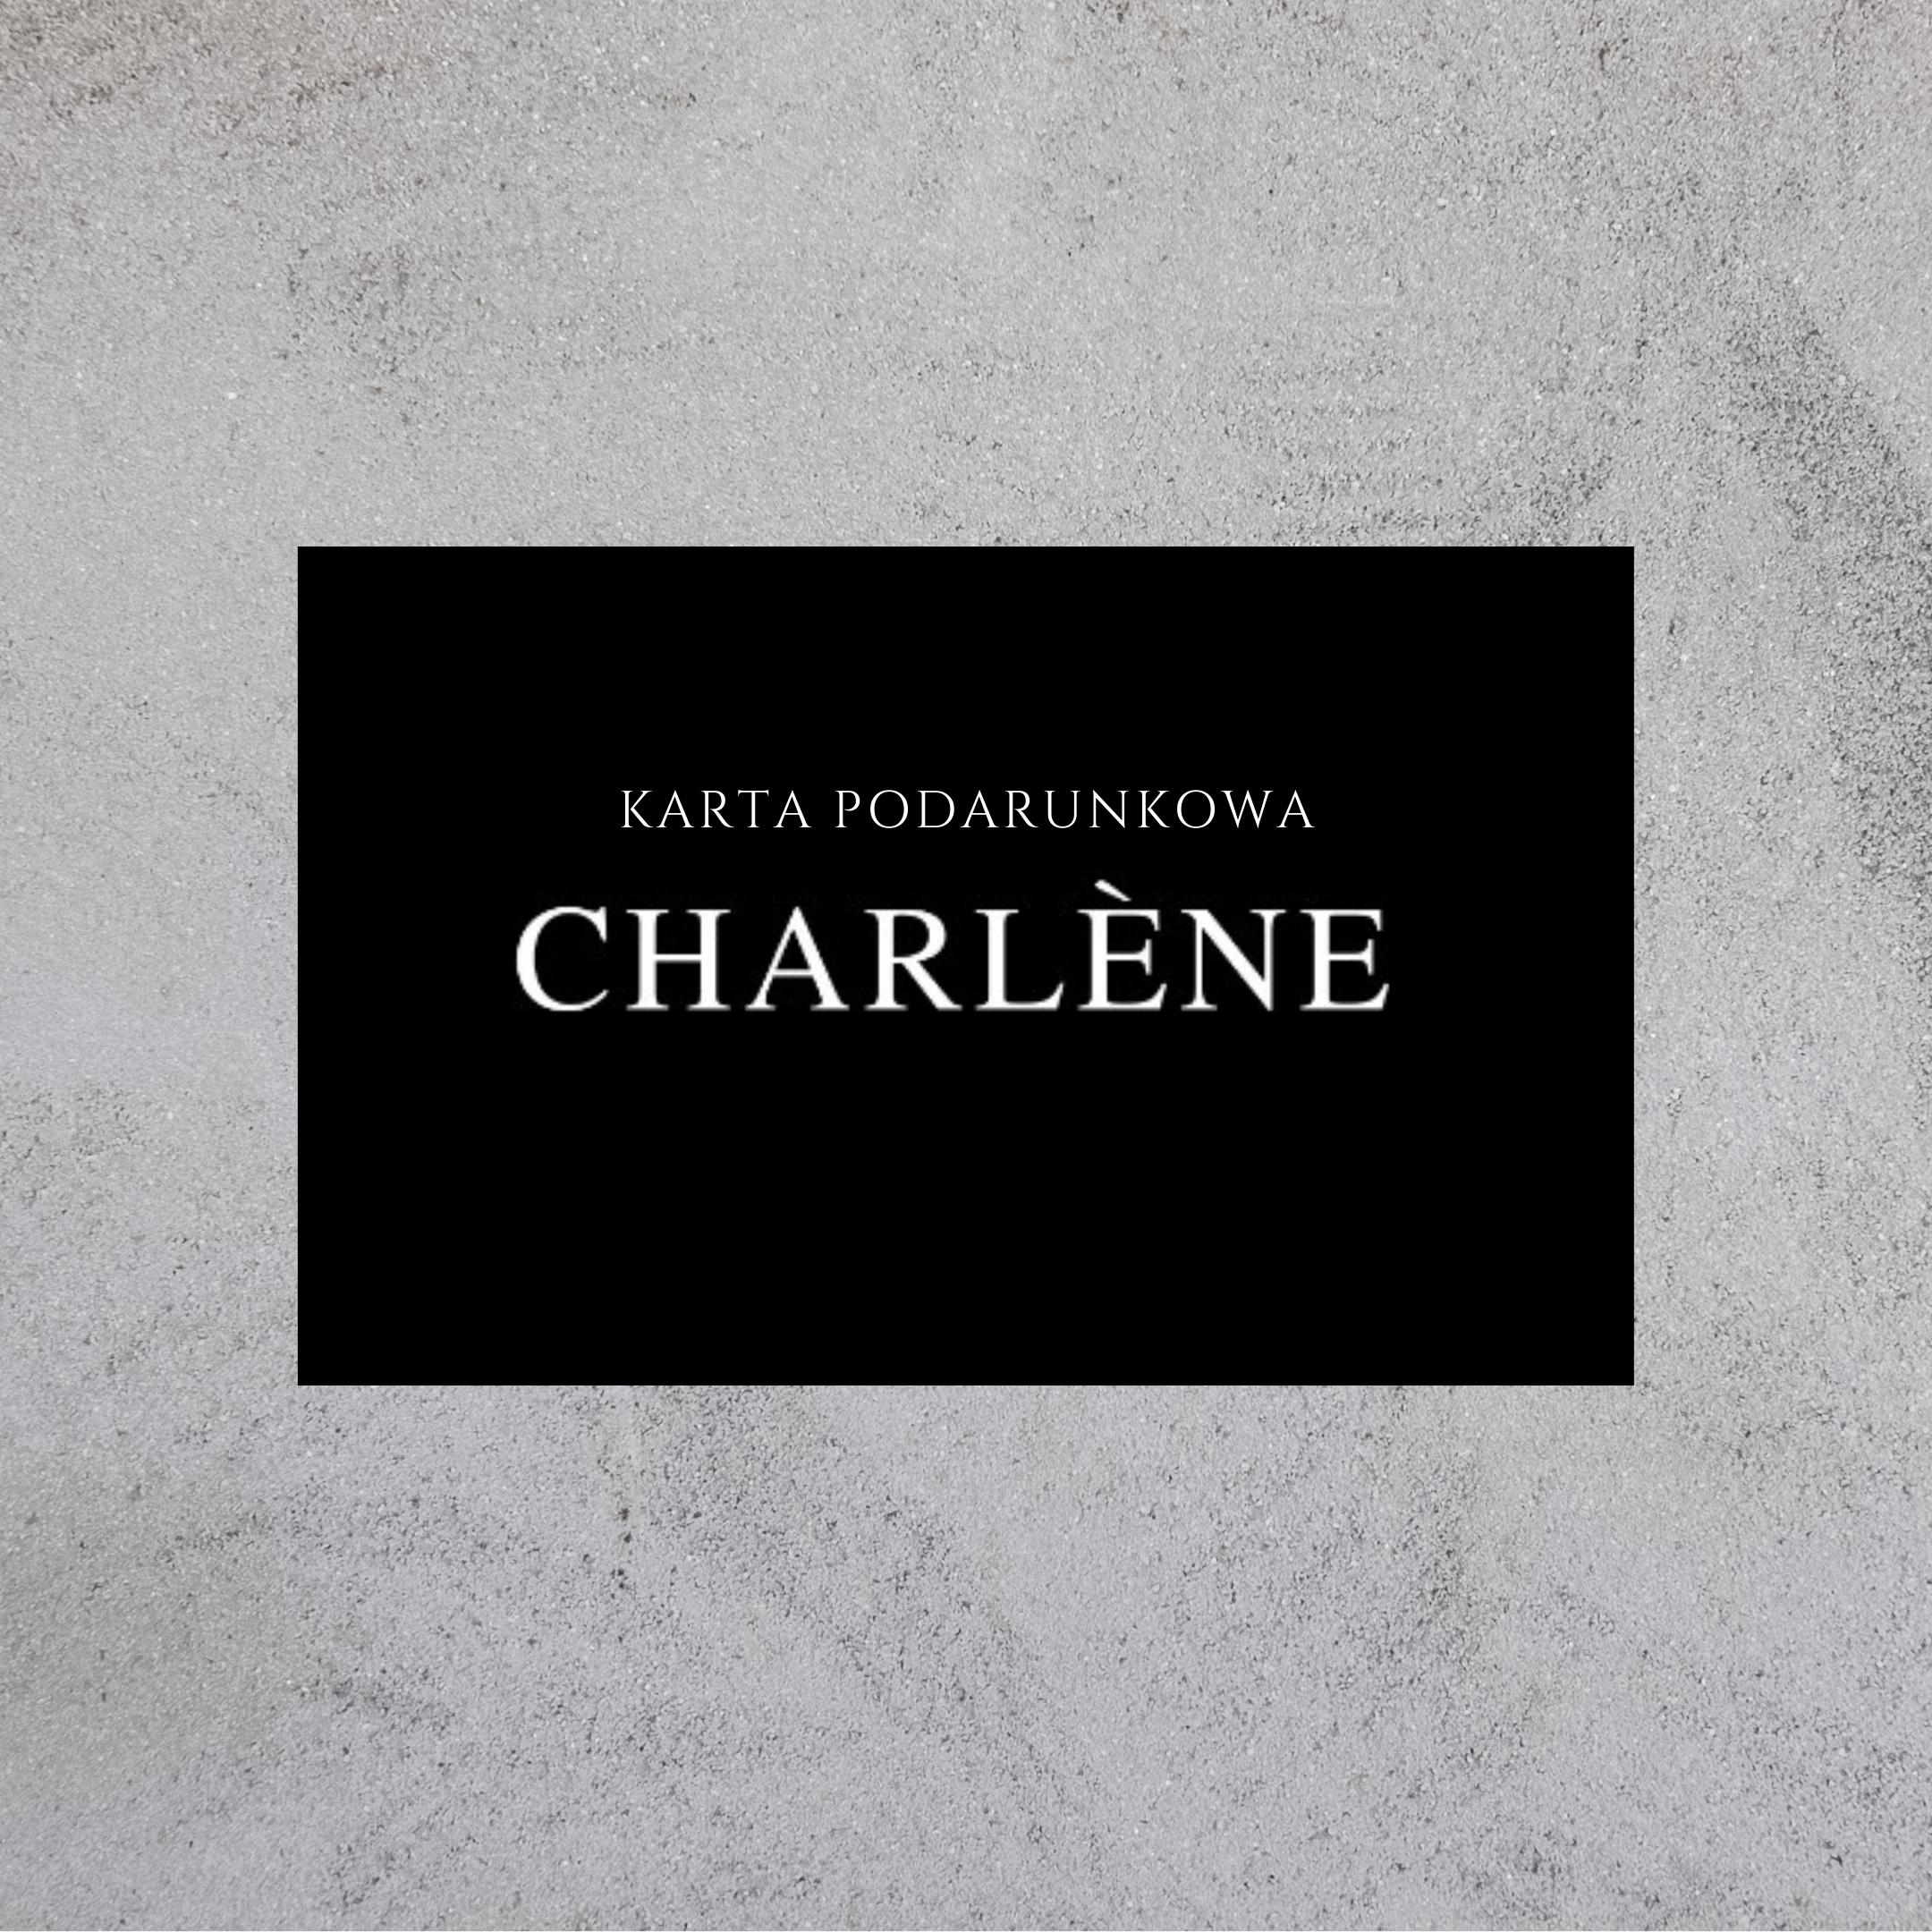 karta podarunkowa charlene